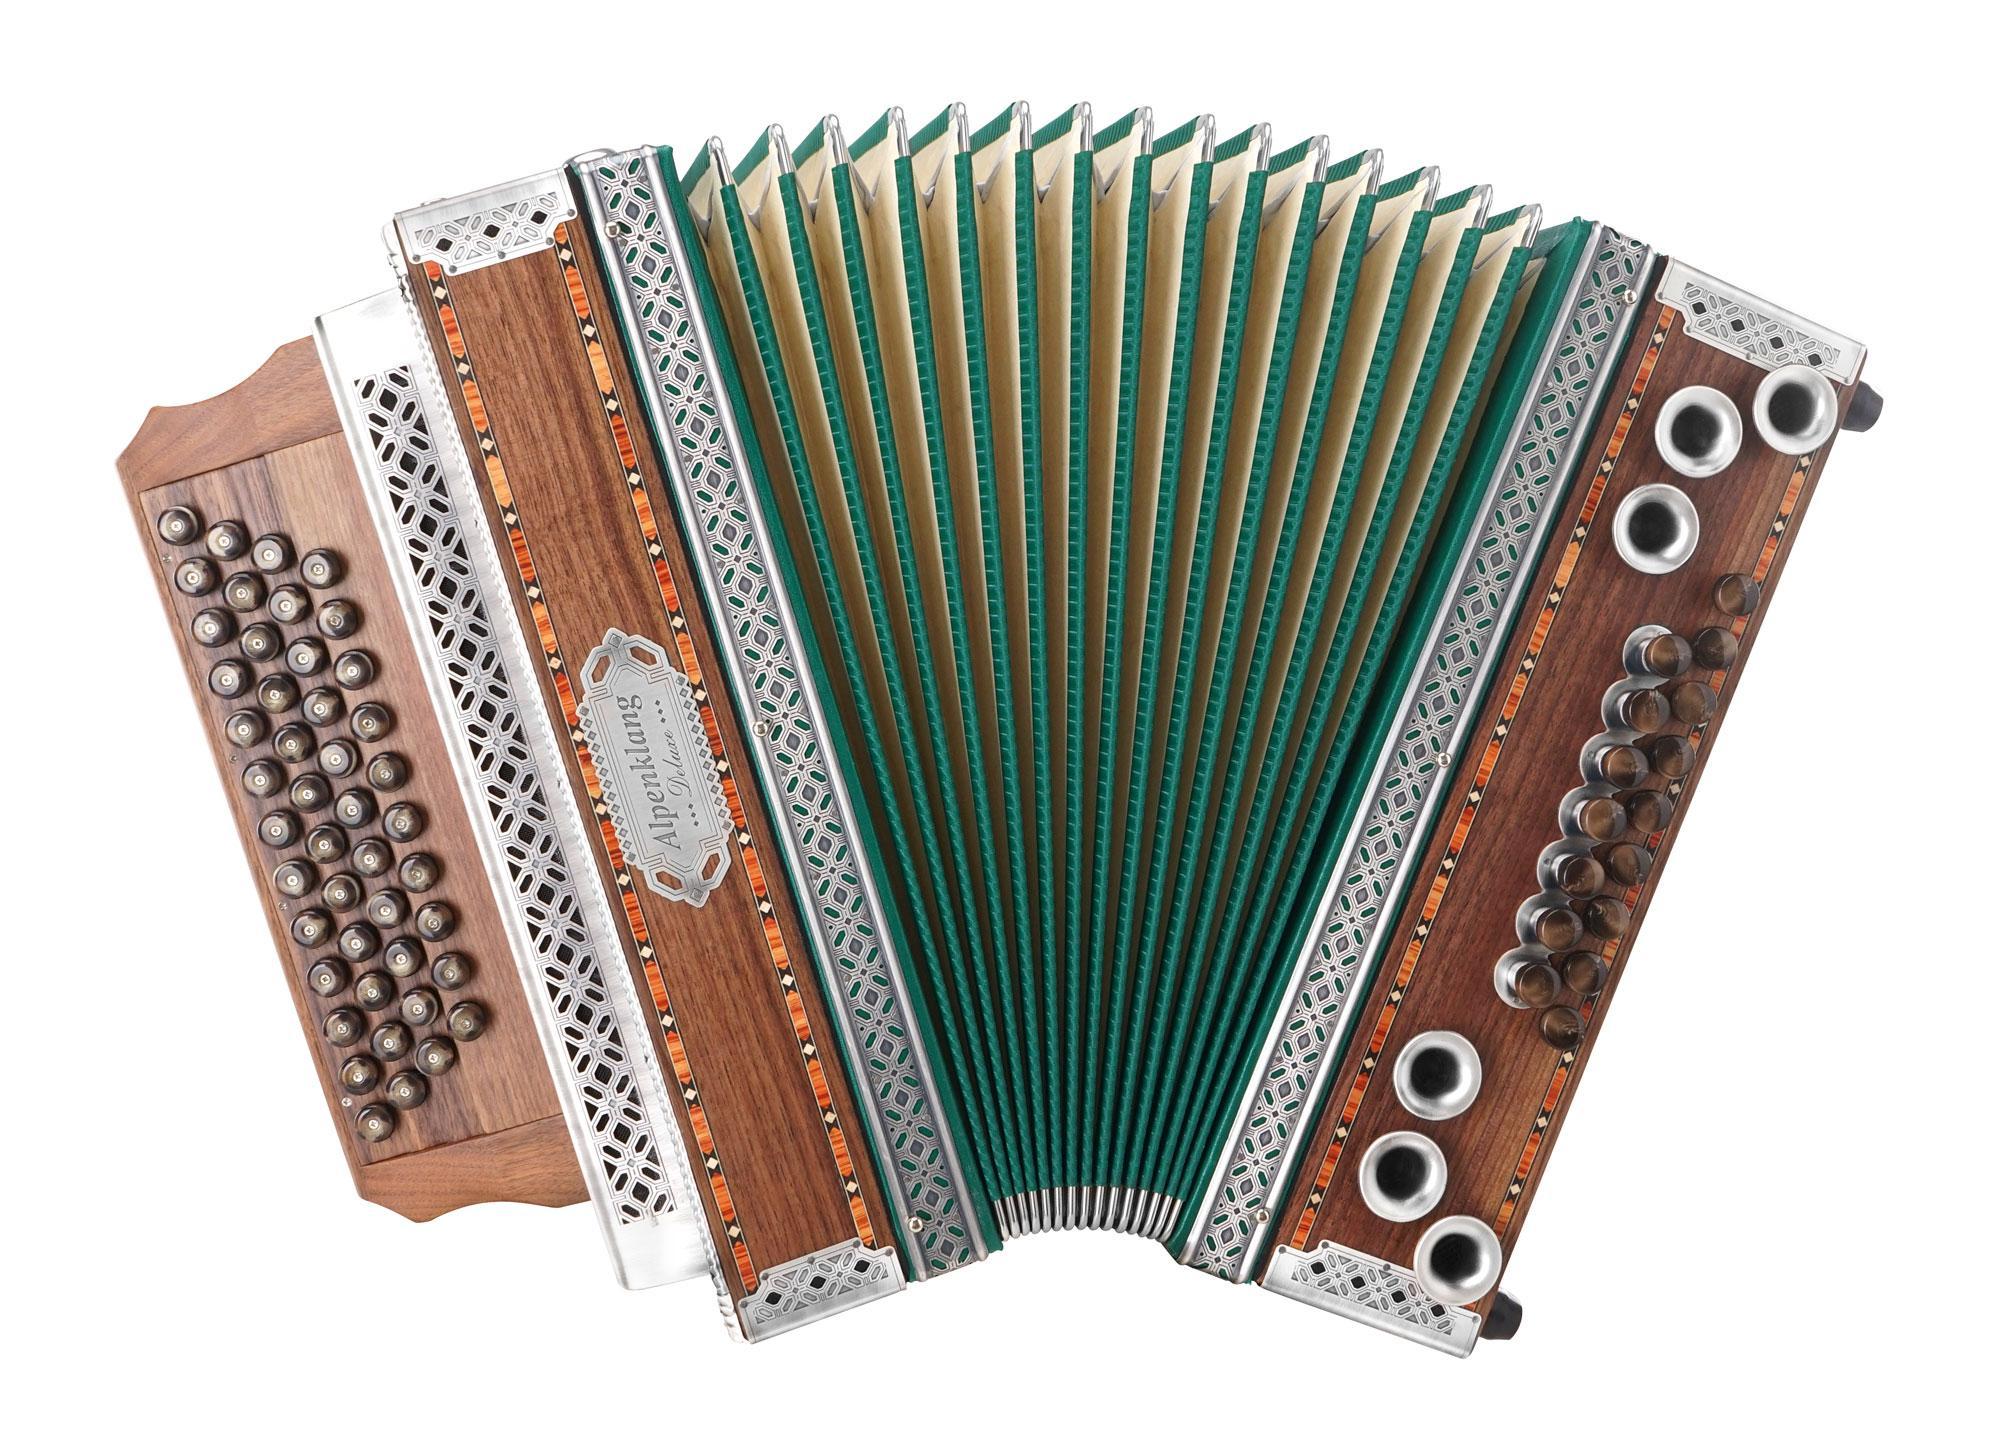 Alpenklang 4|III Harmonika 'Deluxe' G C F B Nuss mit H Bass und Altsilber Beschlägen